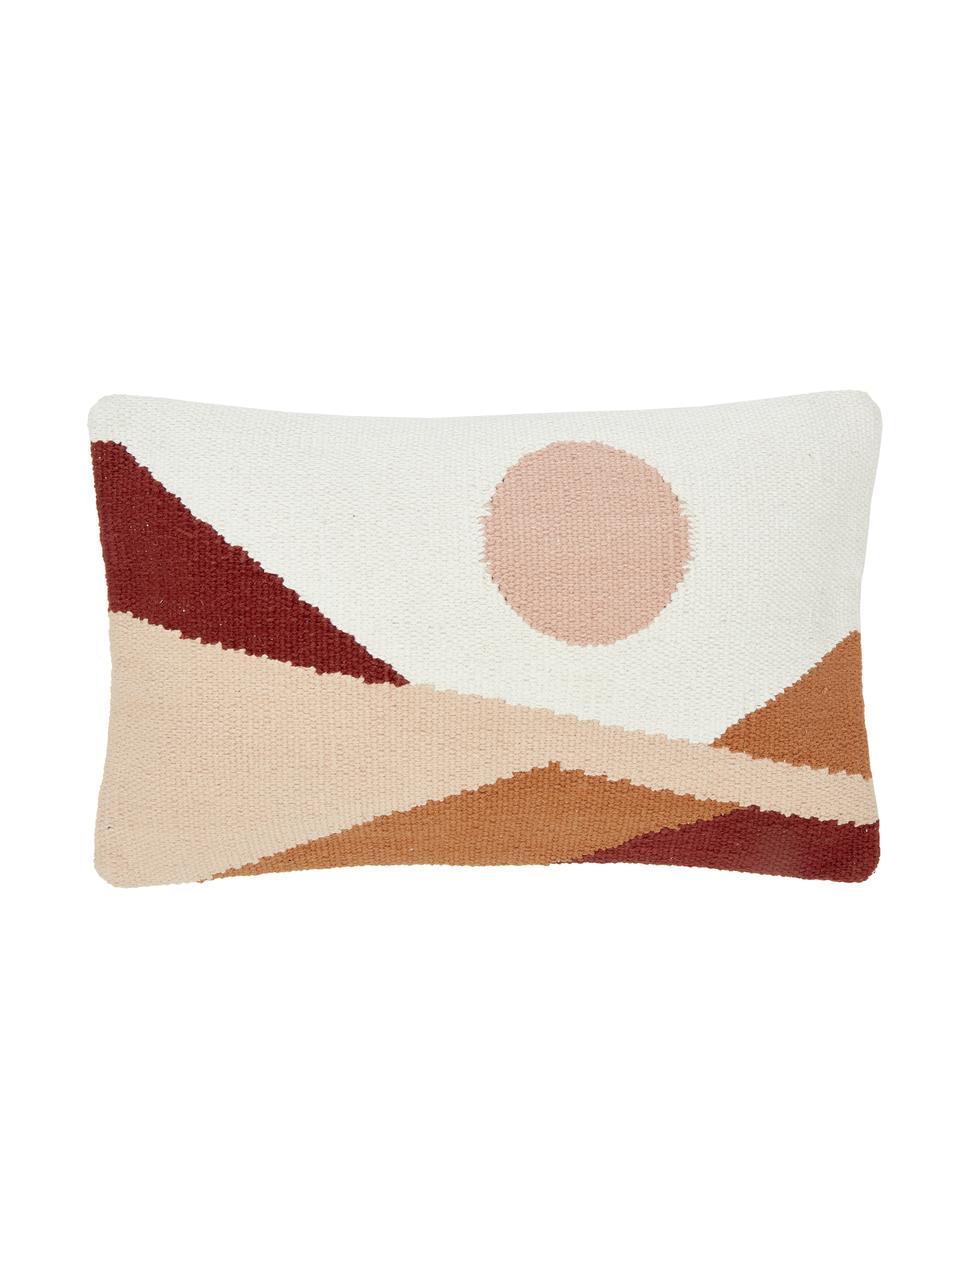 Handgewebte Kissenhülle Beta mit abstraktem Muster, 100% Baumwolle, Rosa,Rot,Weiß, 30 x 50 cm